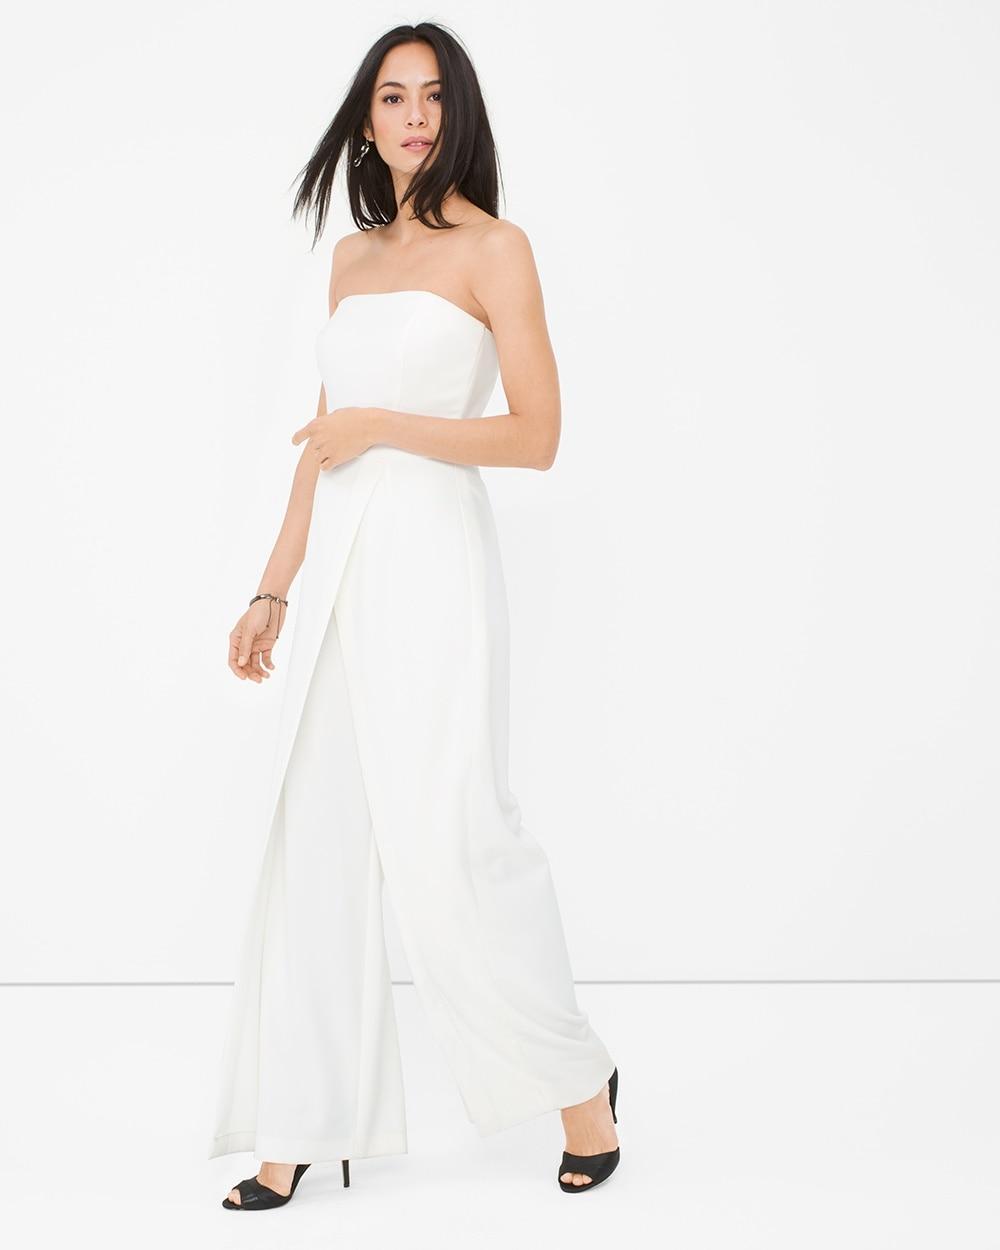 Convertible White Strapless Split Pant Jumpsuit White House Black